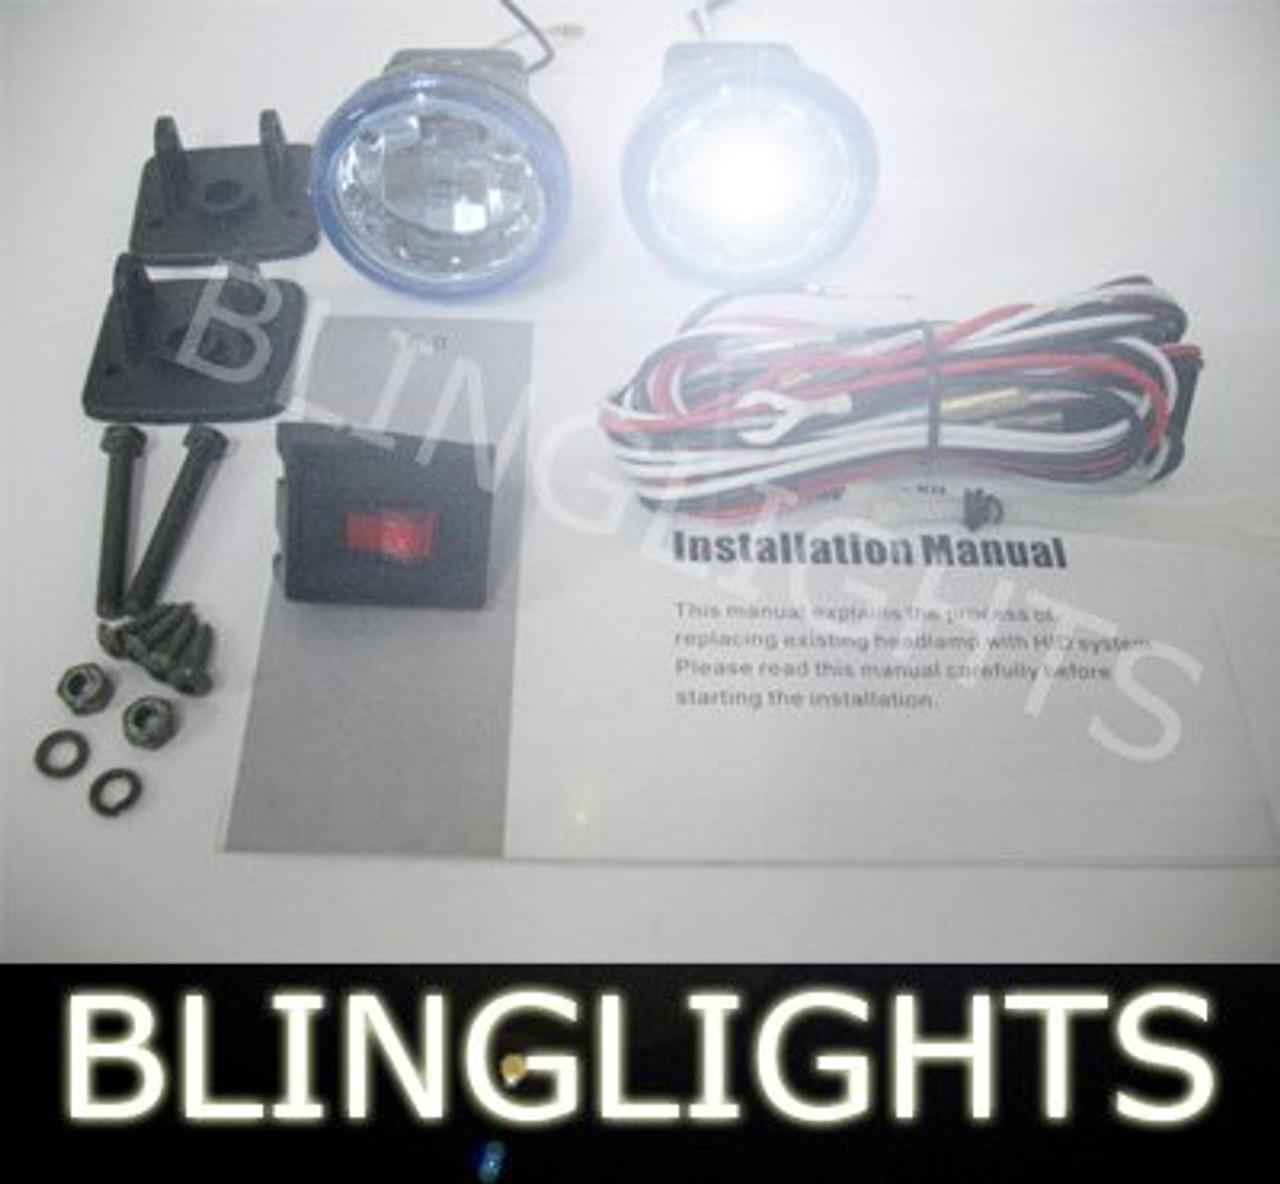 1991 1992 1993 1994 1995 1996 Dodge Stealth r/t tt gto Xenon Foglamps Foglights Fog Lamps Lights Kit